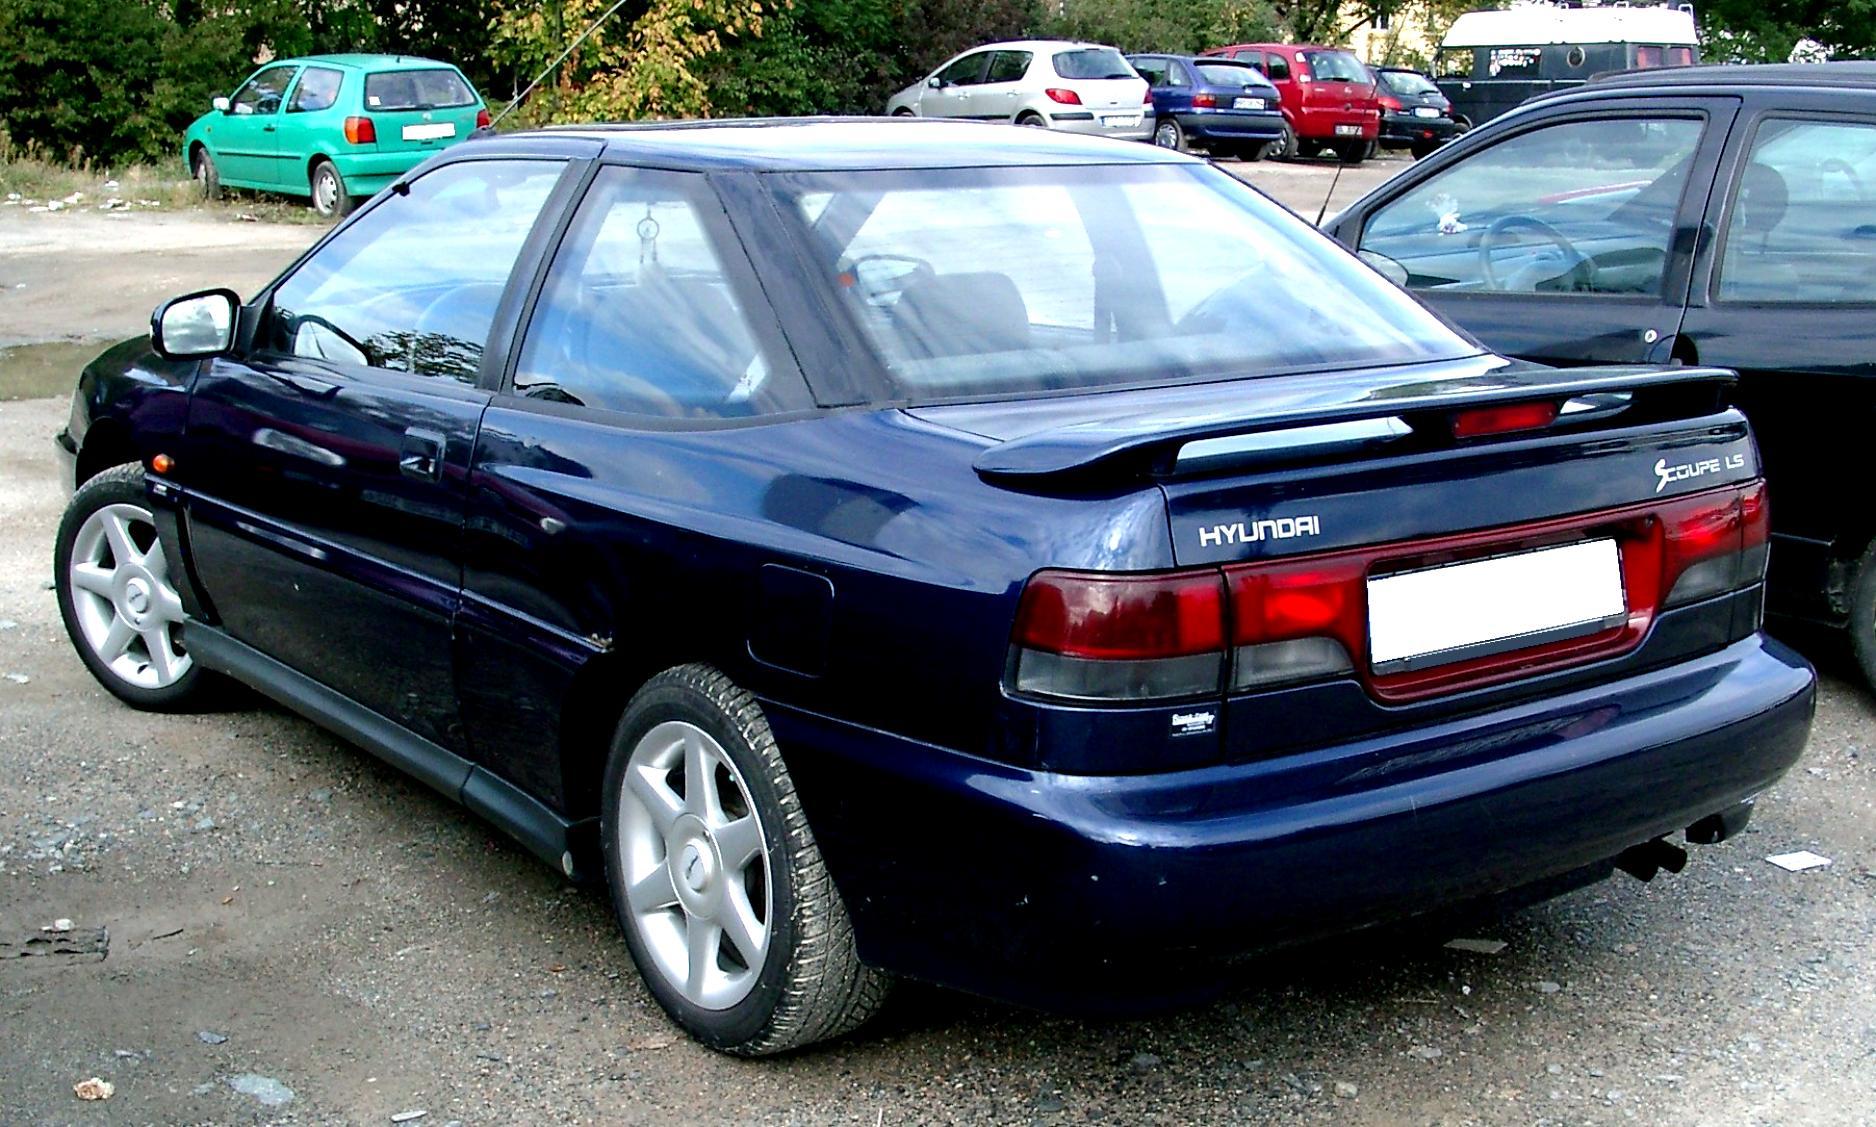 Hyundai scoupe 1990